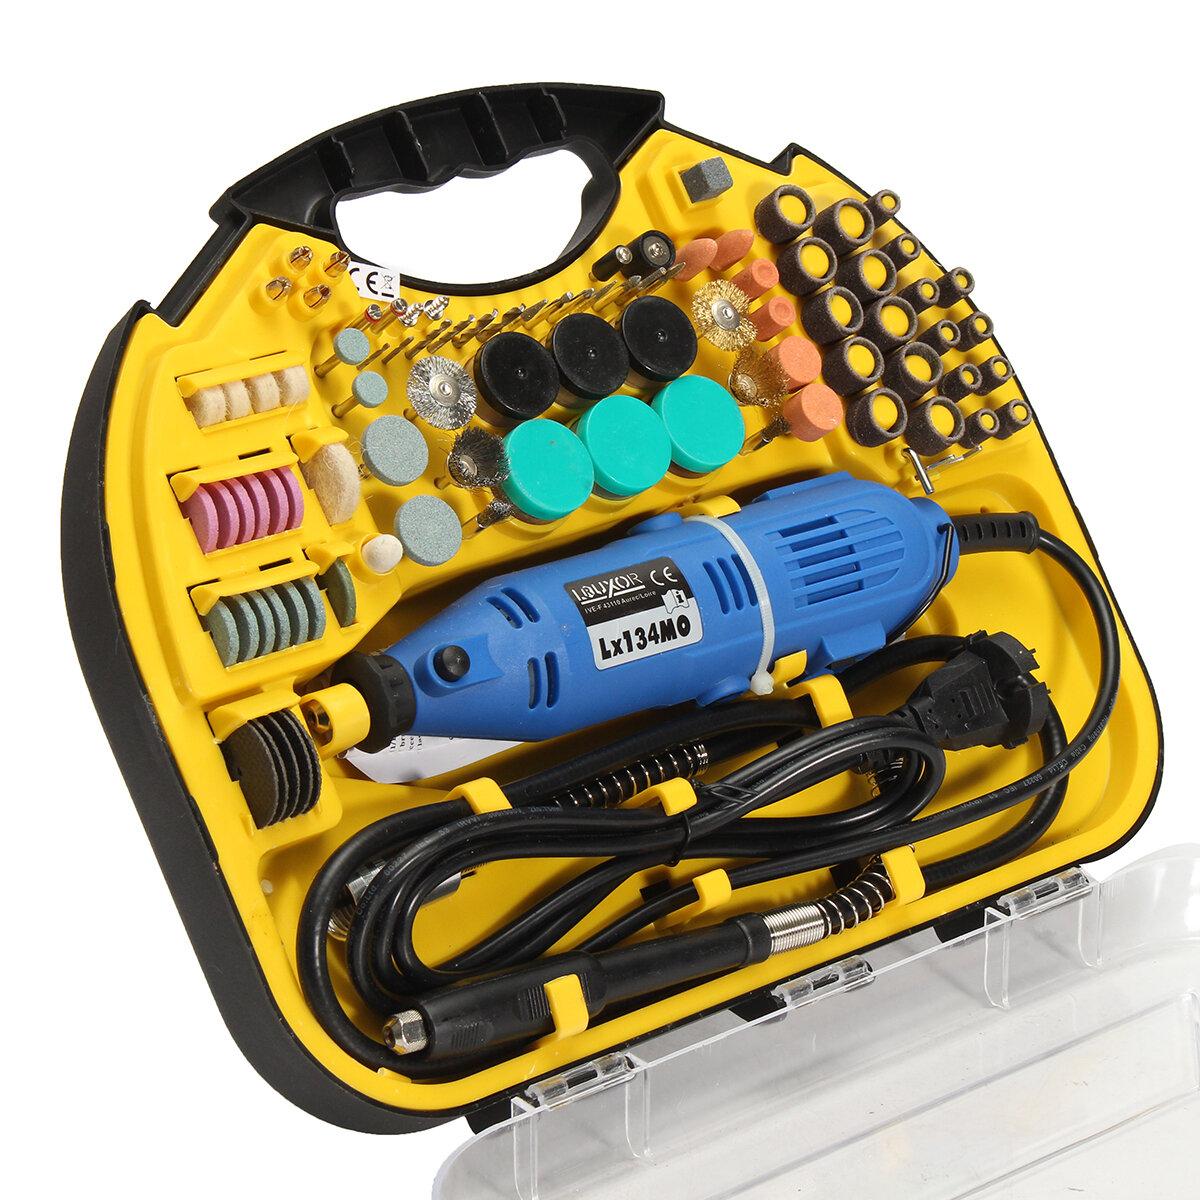 Drillpro AC 220 V Elektrikli Döner Matkap Öğütücü Gravür Parlatıcı DIY Parçalar Elektrikli Matkap Seti